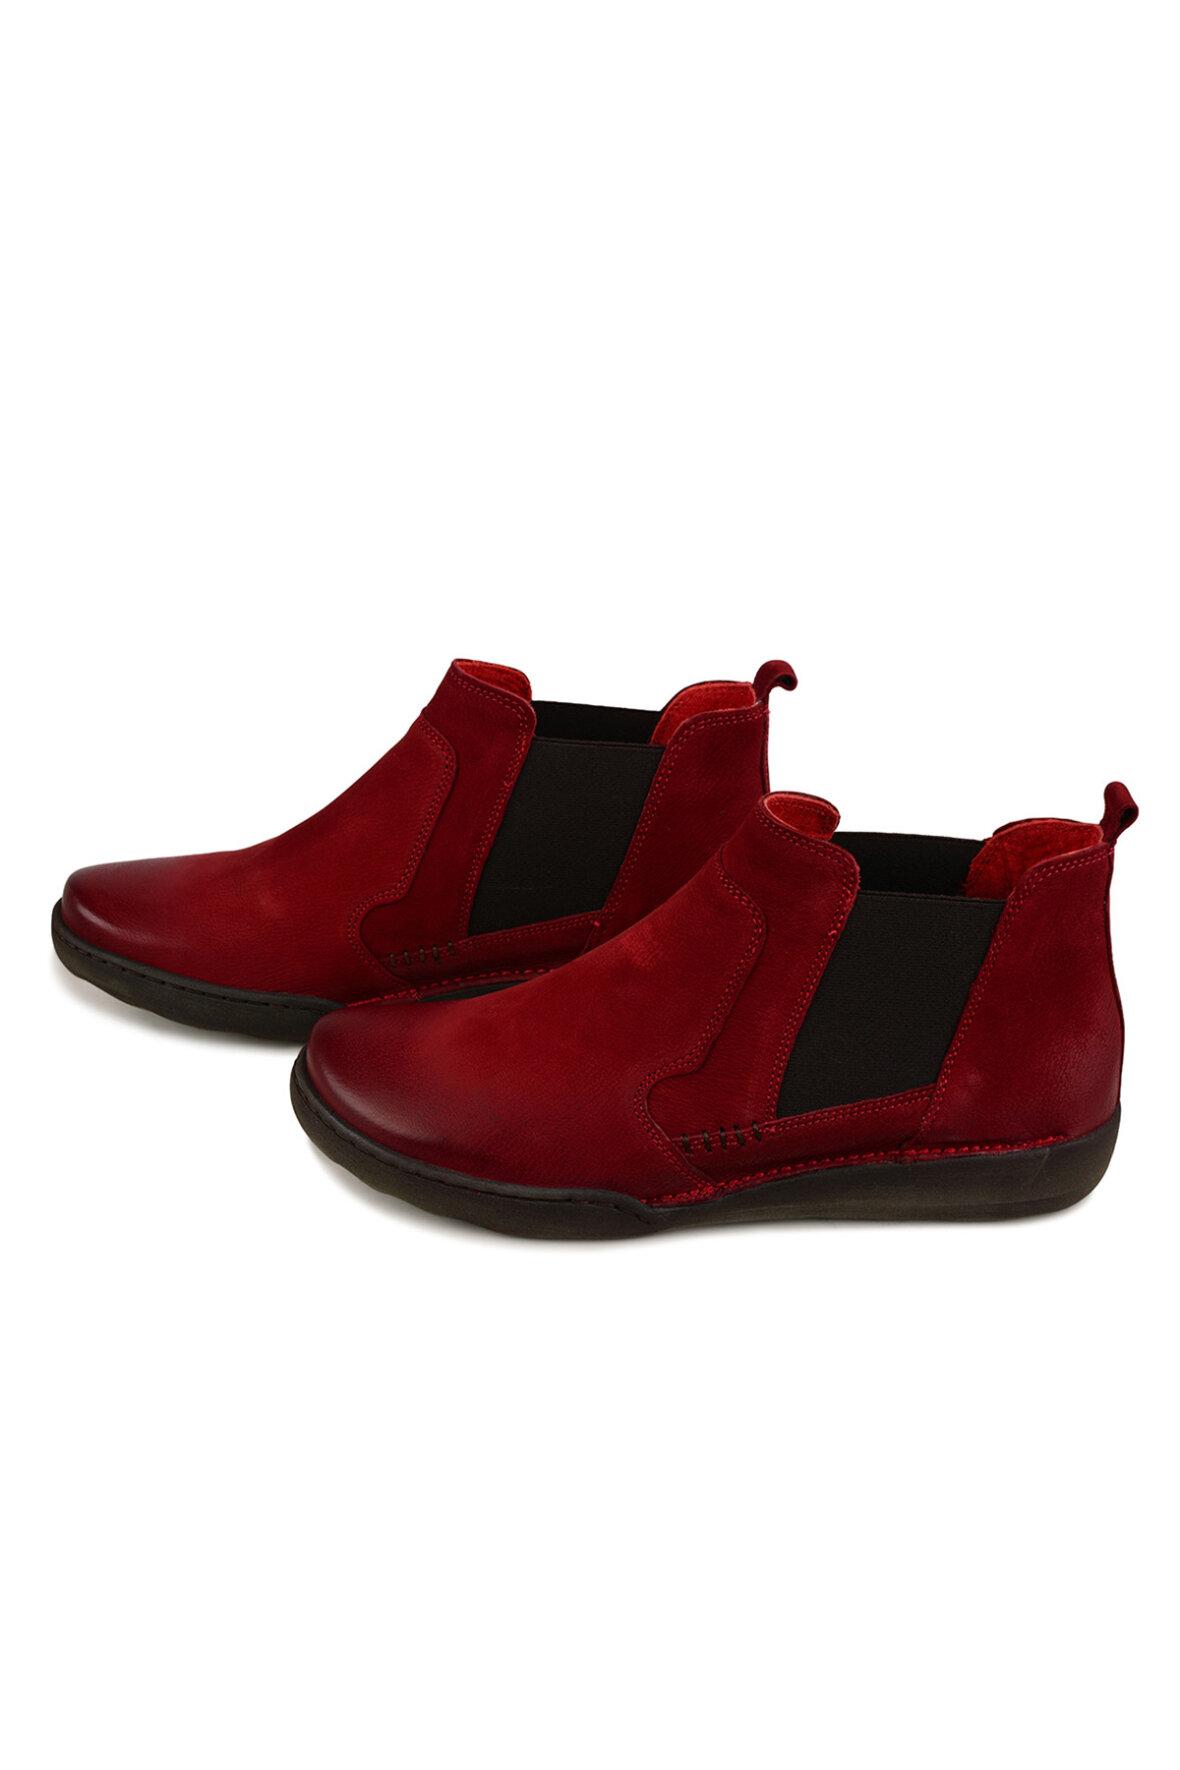 94b465ae Relaxshoe Rød Støvlet i skind super komfortabel - Hos Lohse